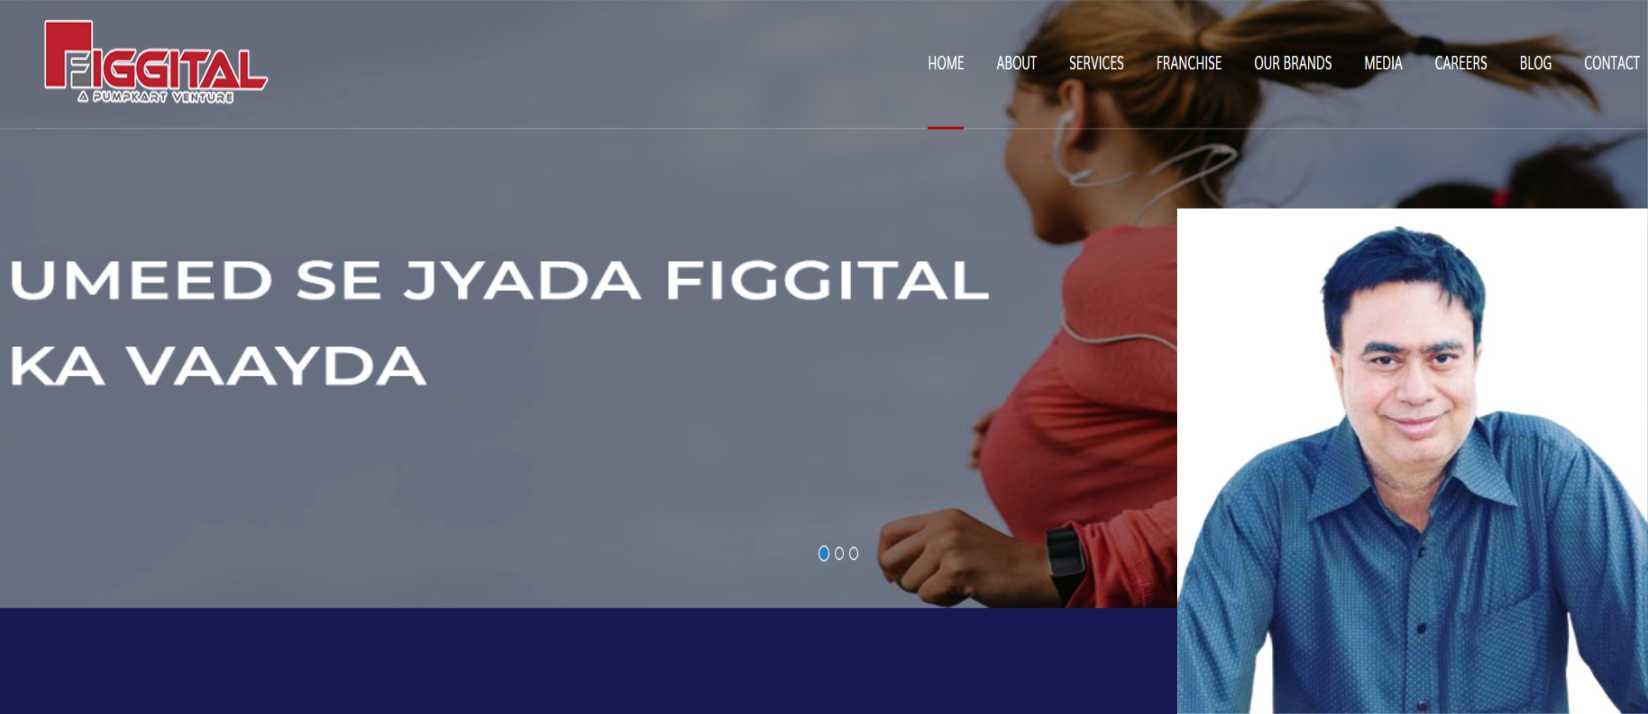 Pumpkart all set to unveil hyper-local e commerce model 'Figgital'